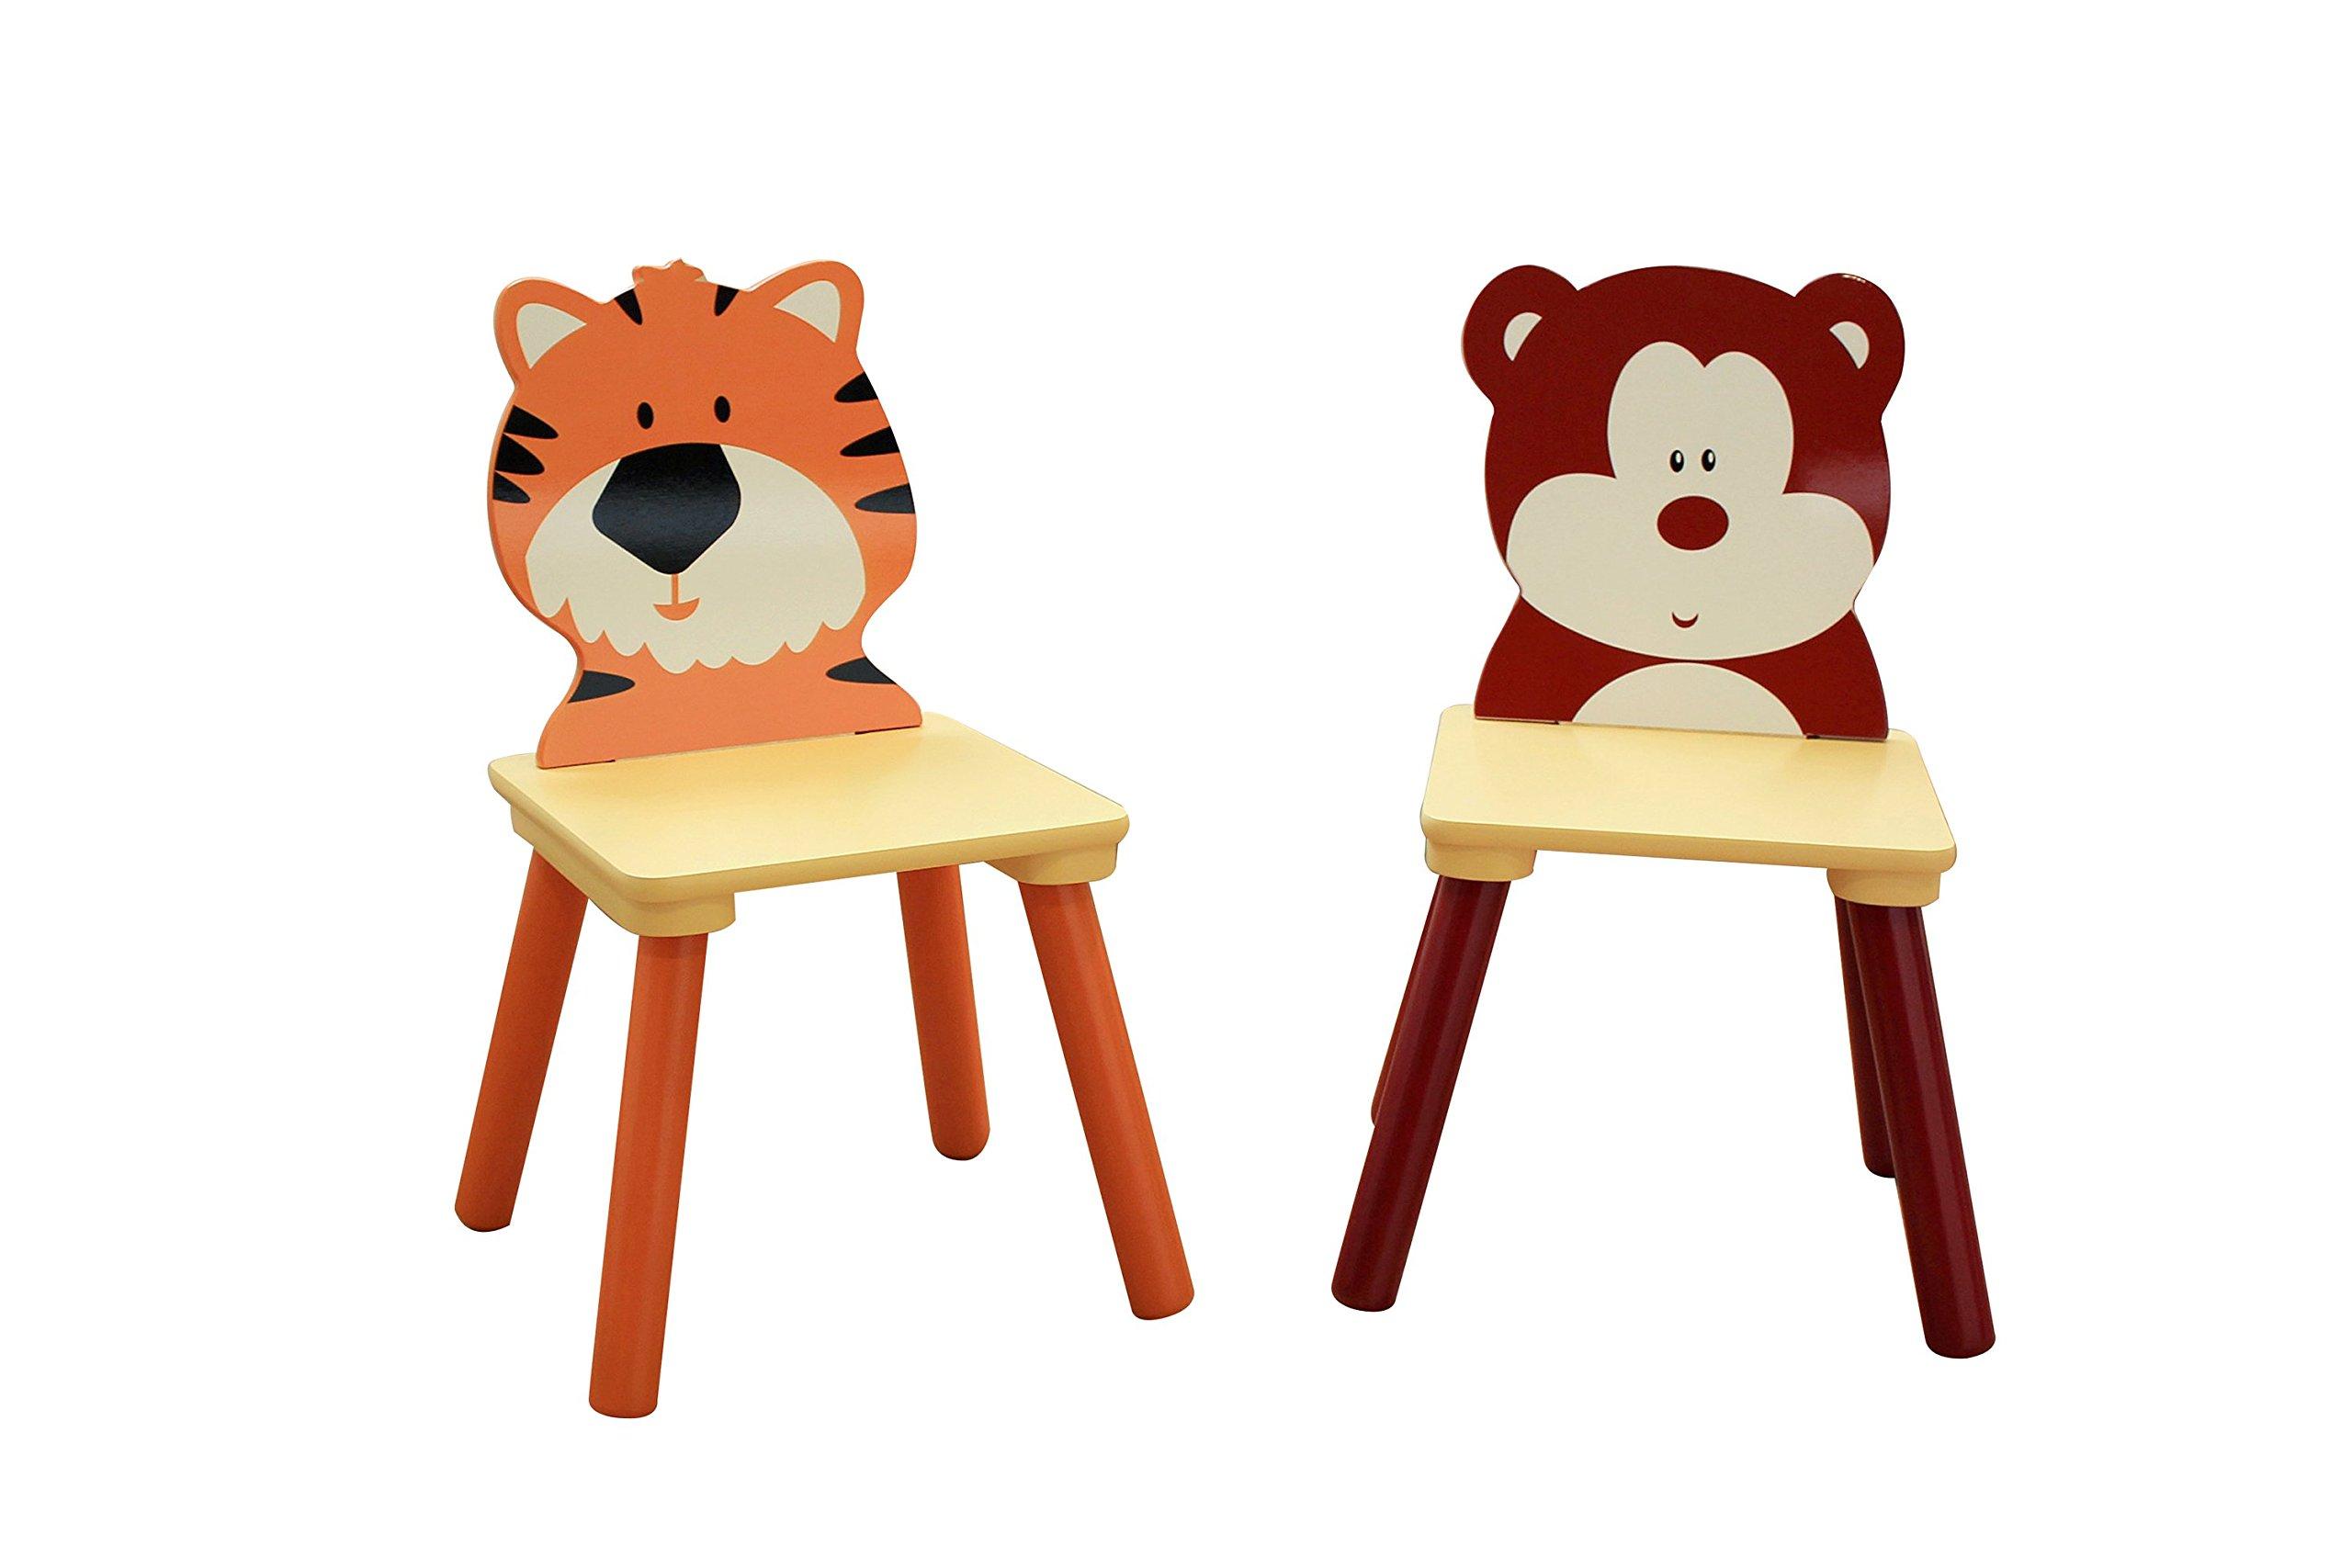 Liberty House Toys Juego de sillas de salón, con diseño de la Selva, Madera